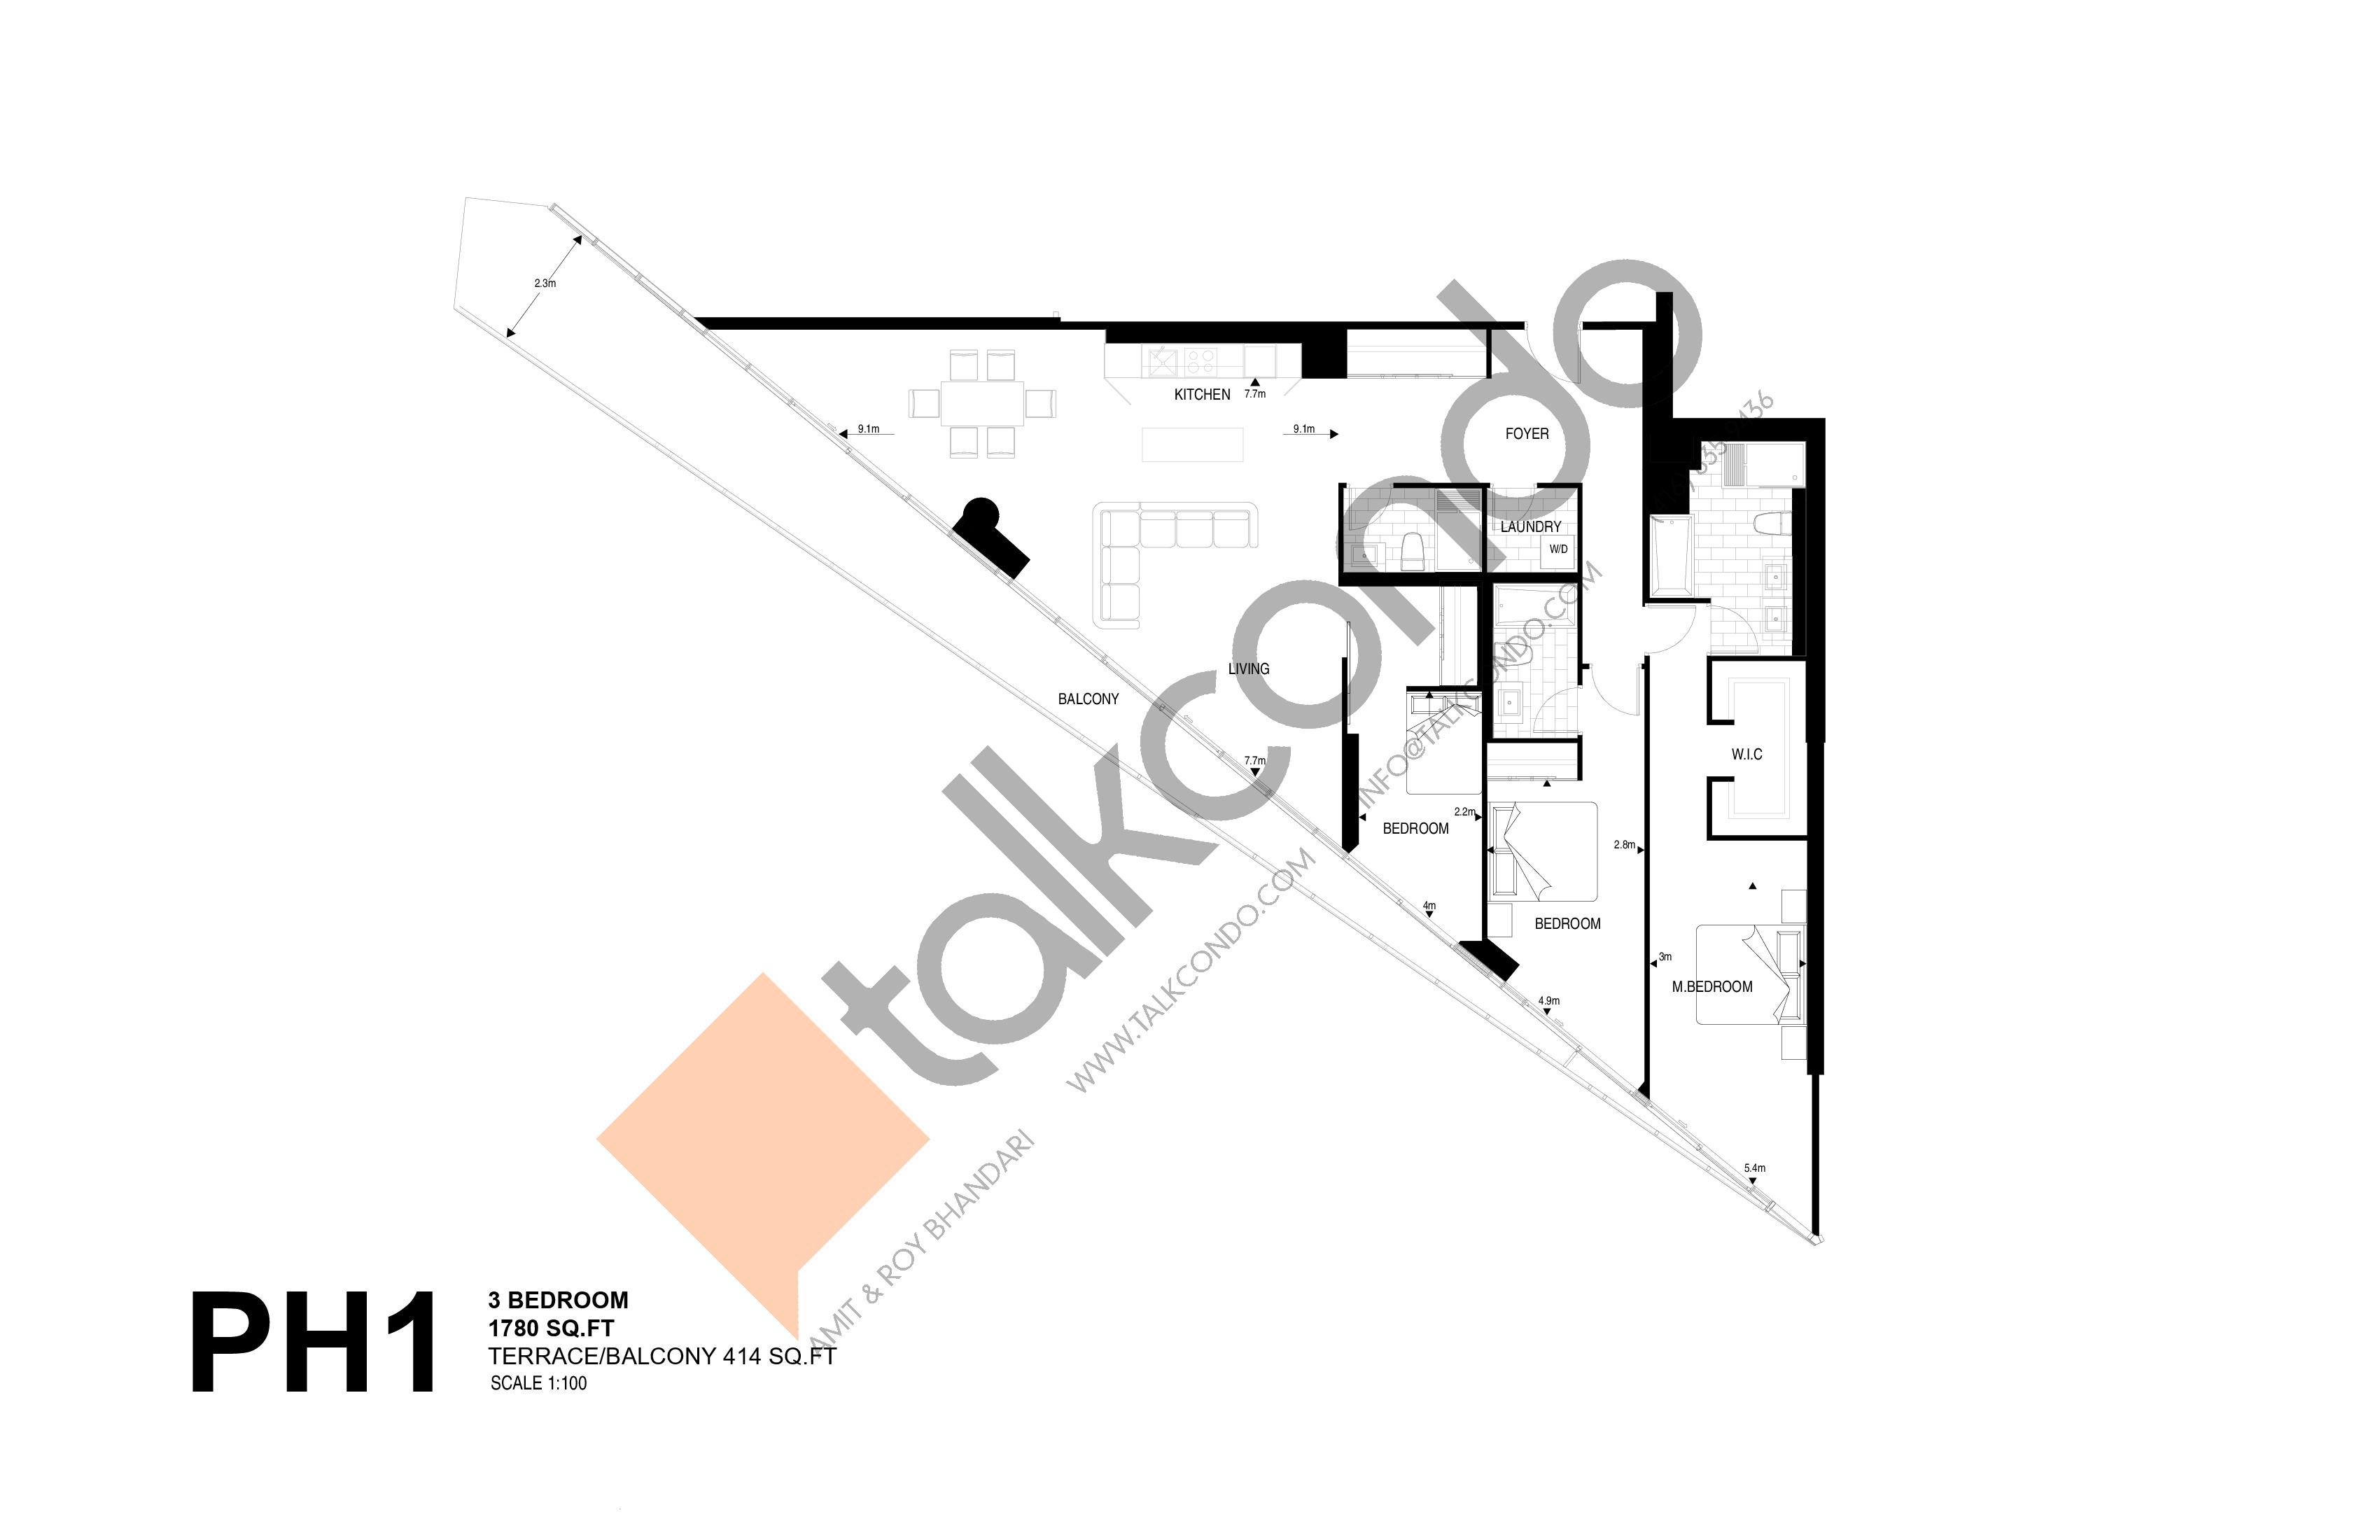 PH1 Floor Plan at Harris Square Condos - 1780 sq.ft